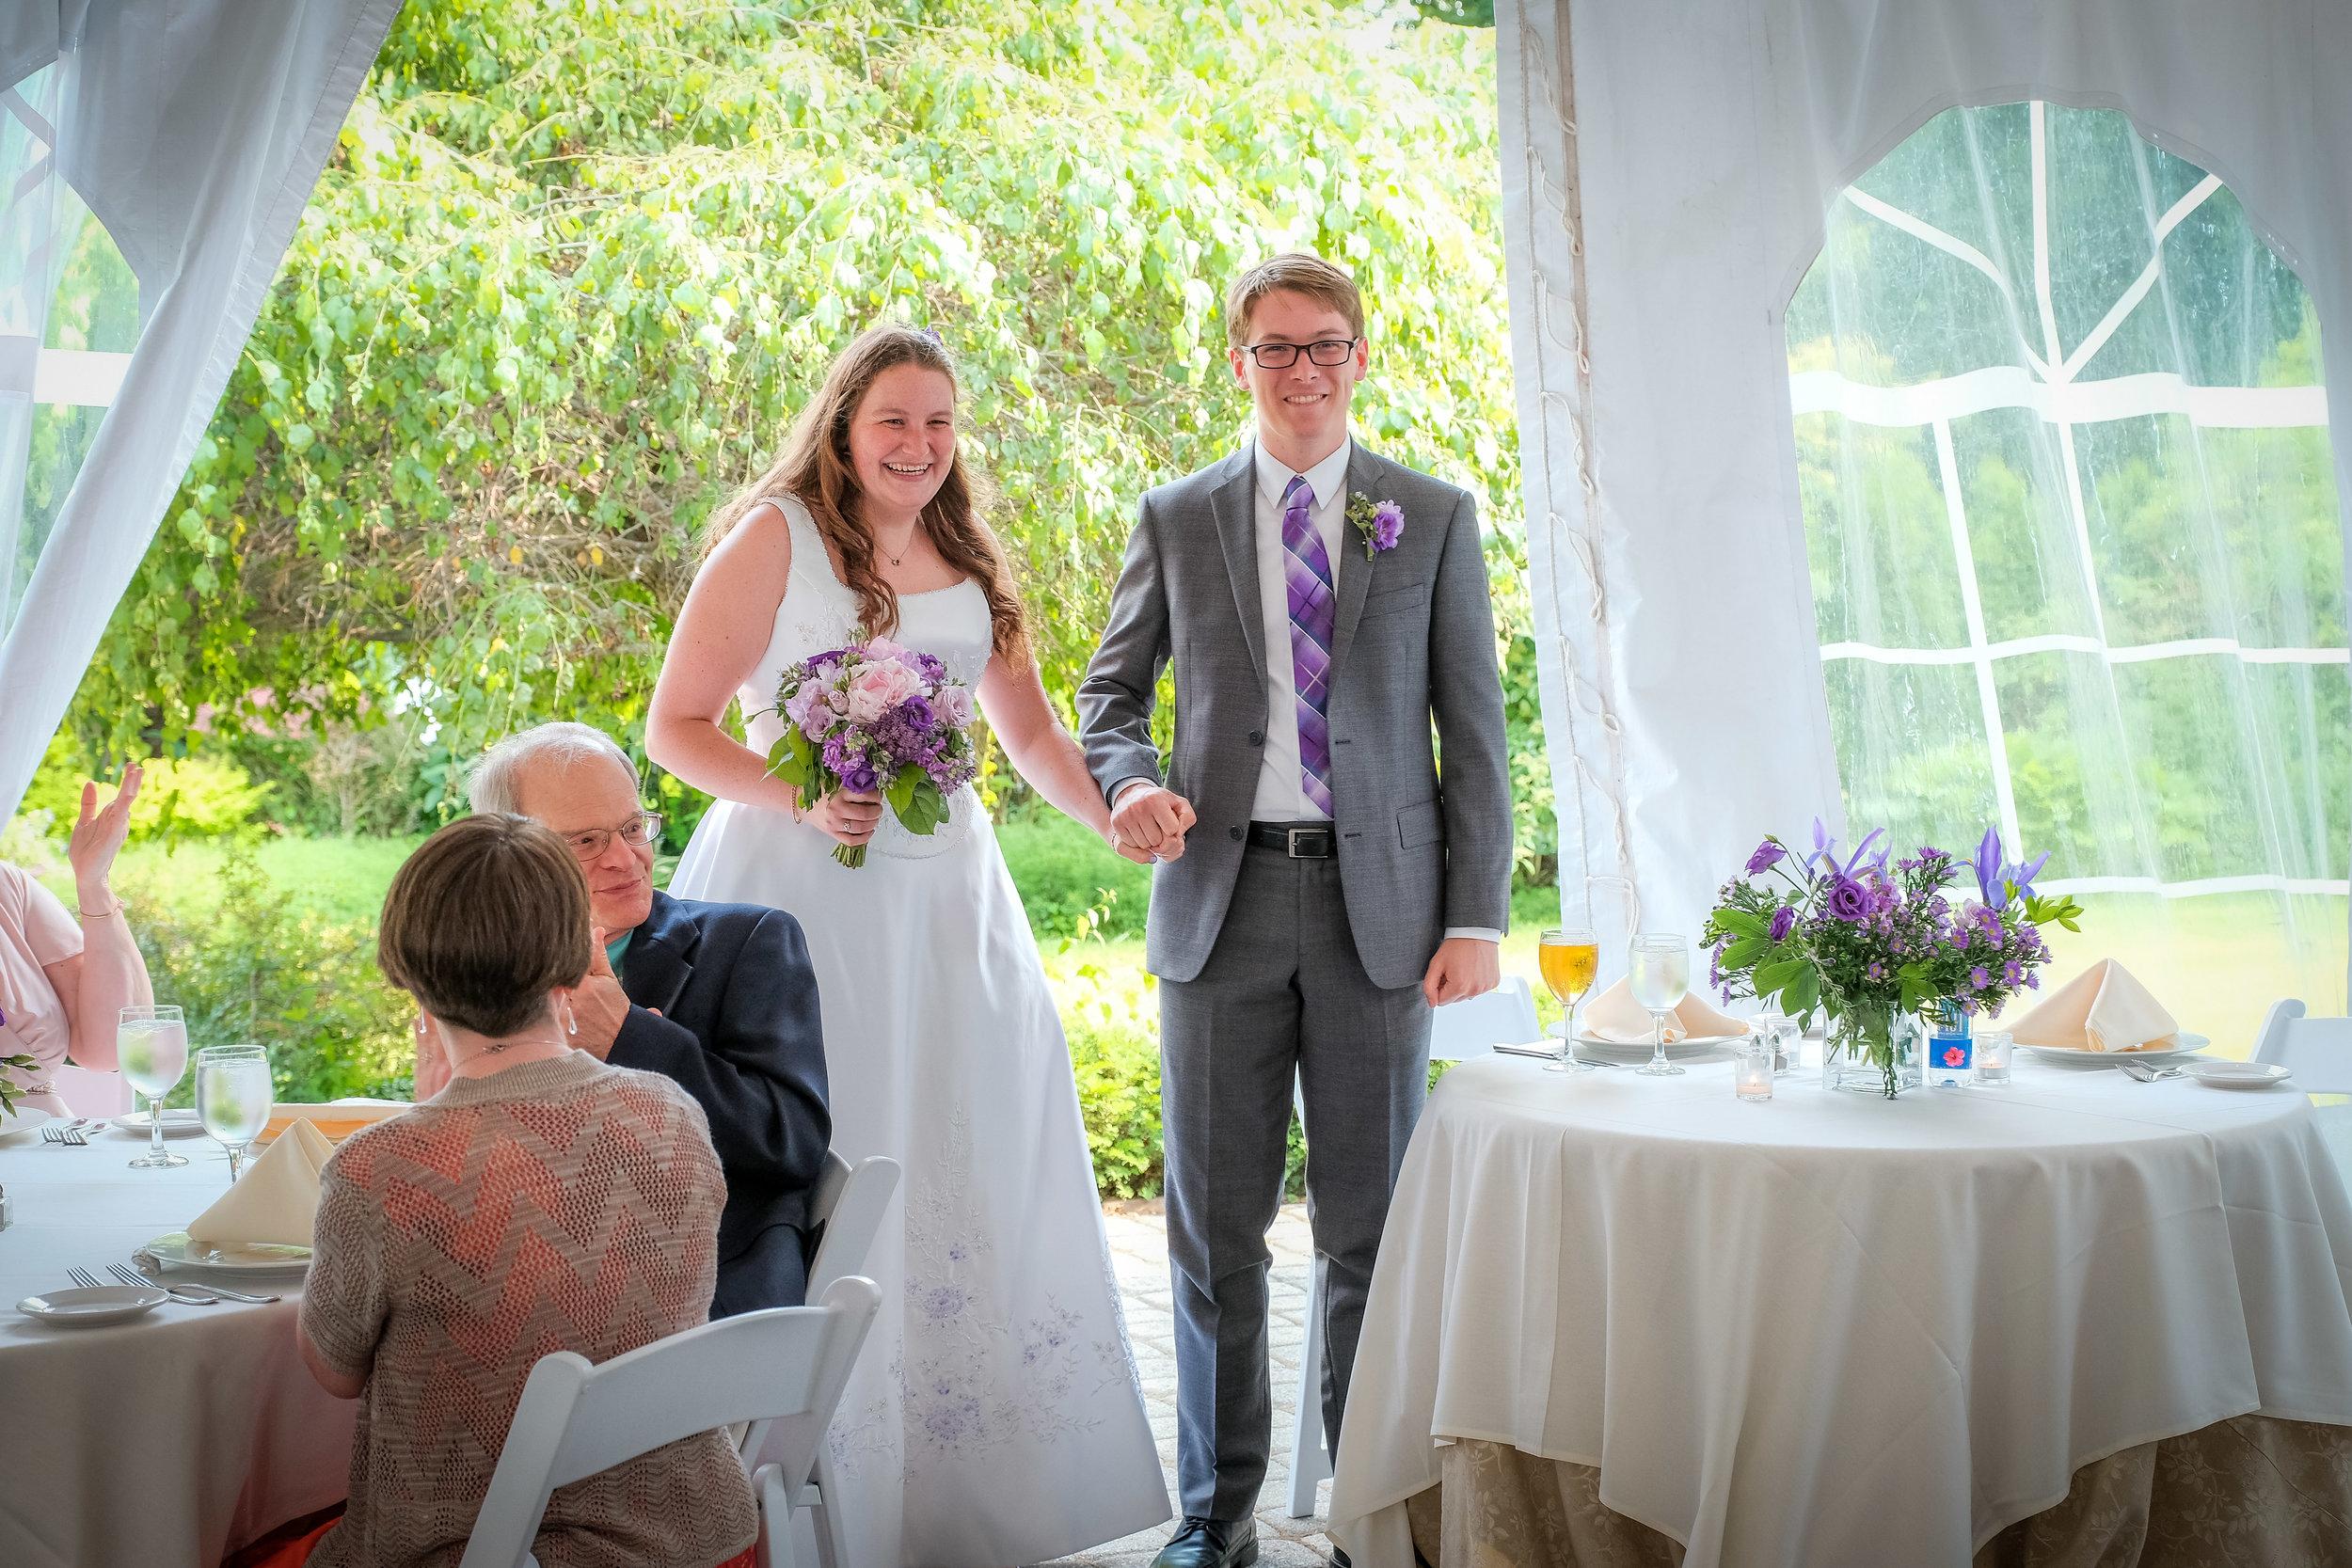 Vermont-Lilac-Inn-Wedding-Photography-894.jpg